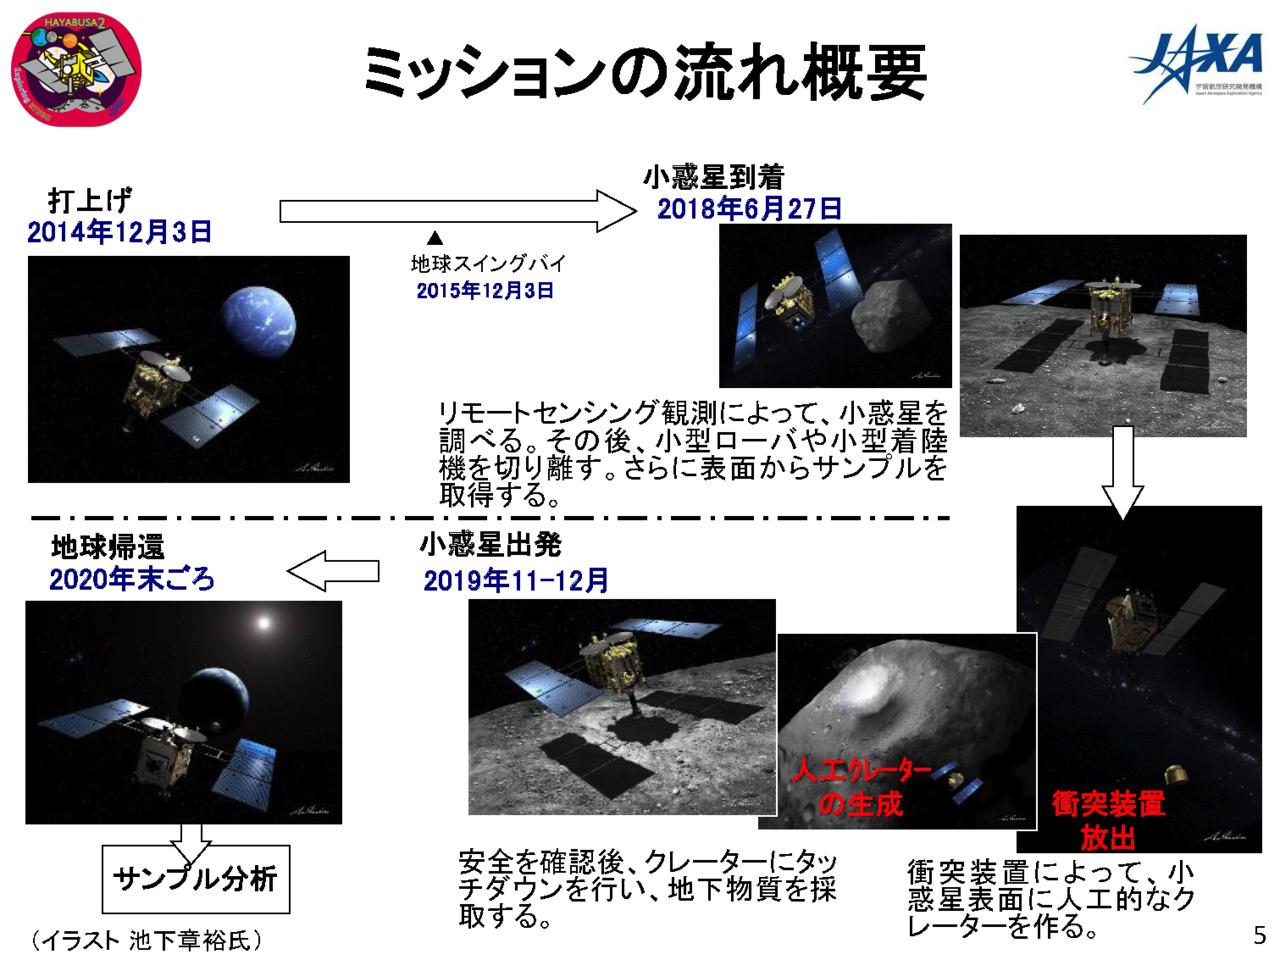 f:id:Imamura:20180802145925p:plain